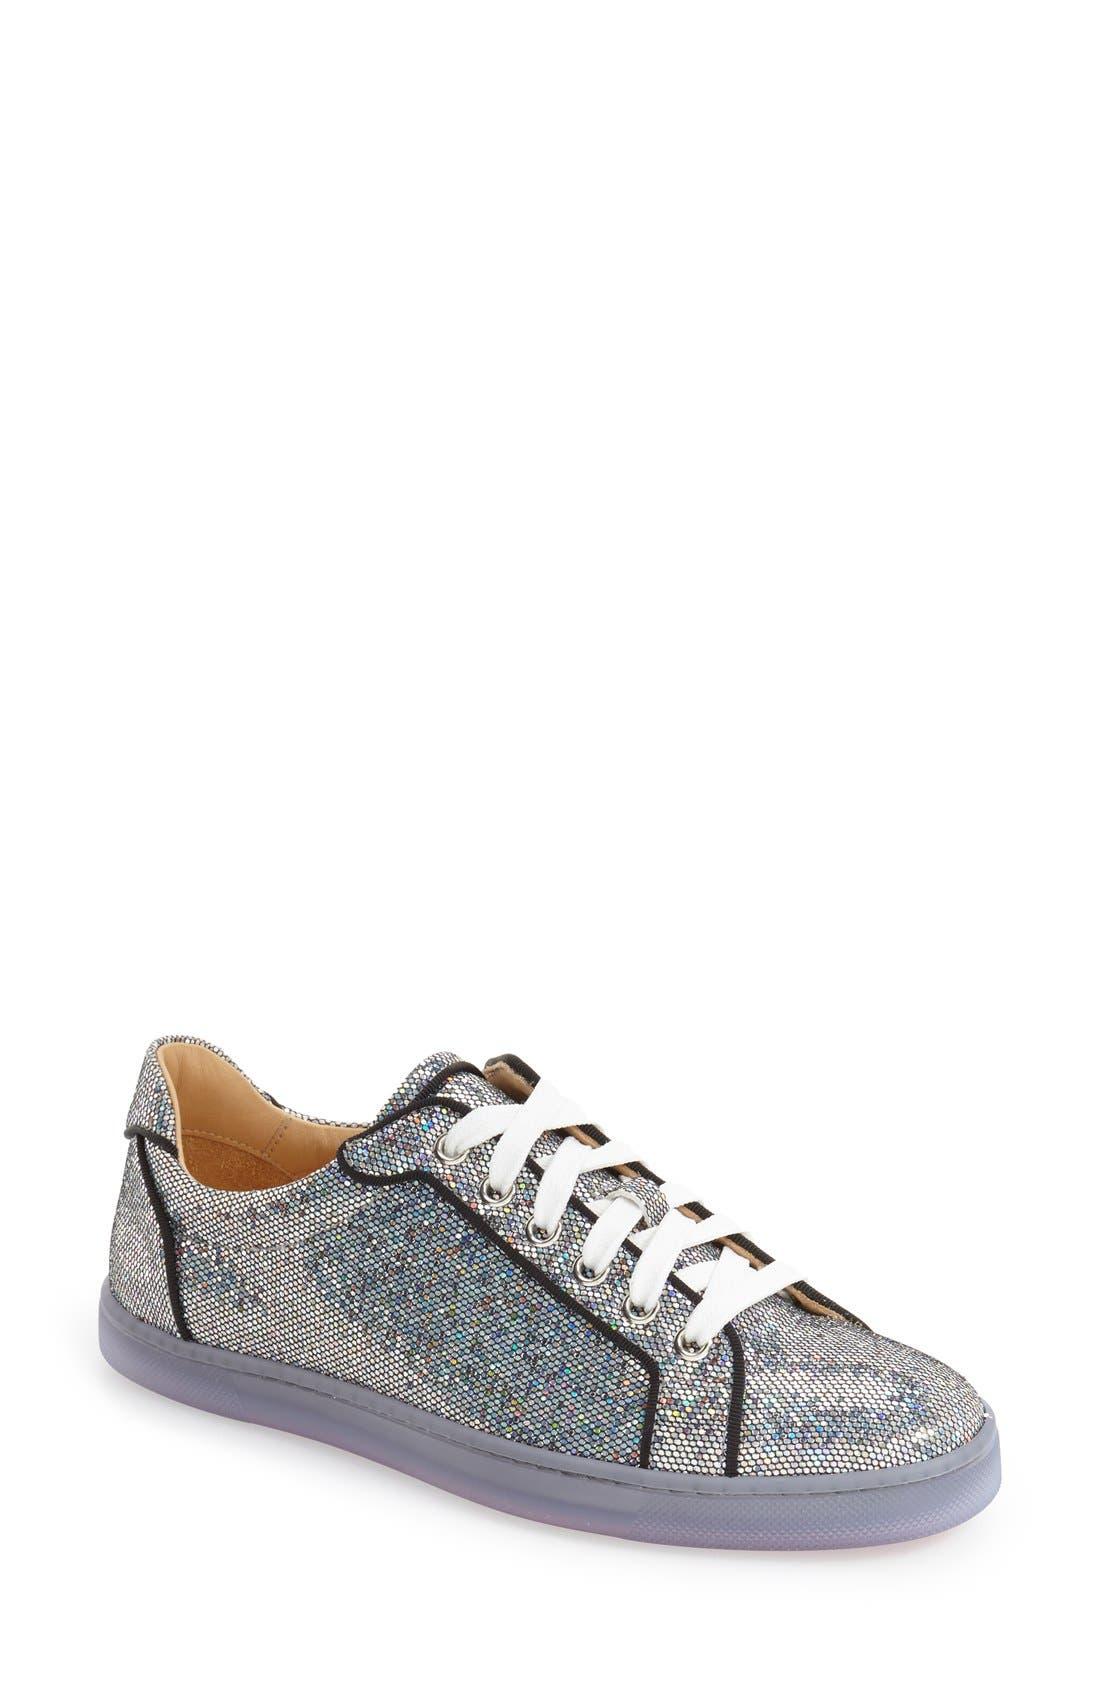 'Seava' Disco Ball Glitter Sneaker,                             Main thumbnail 1, color,                             040